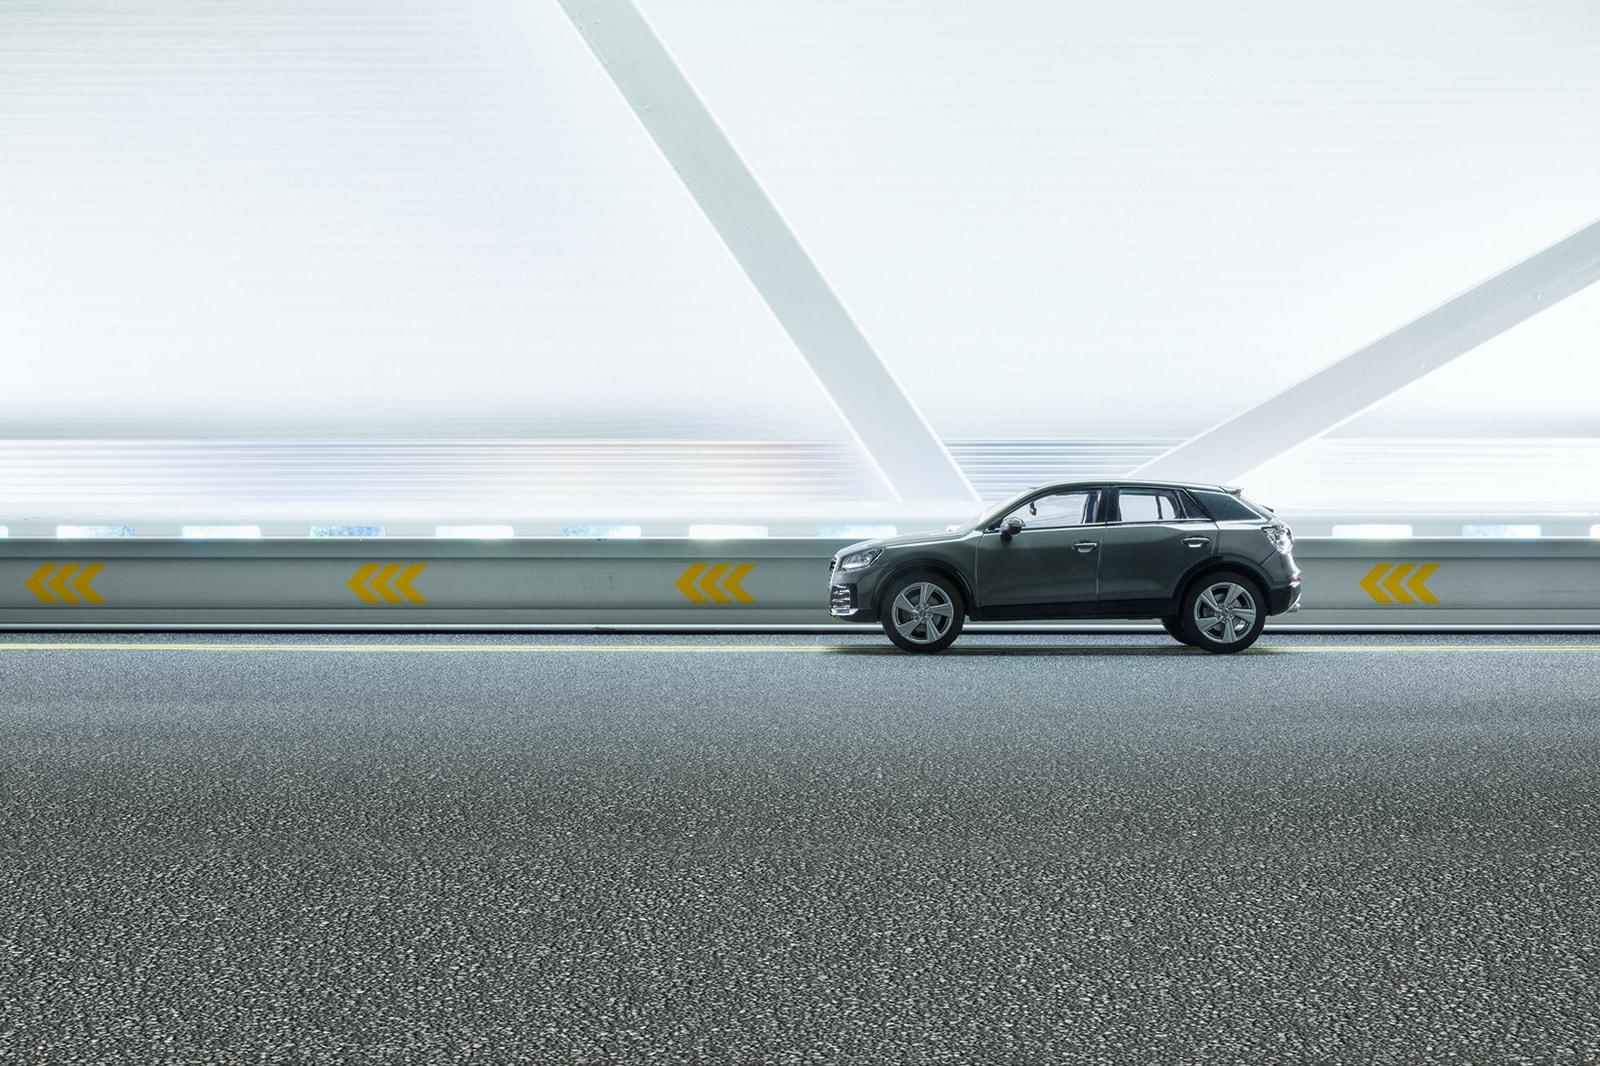 Audi Q2 Felix Hernandez 1/43 Scale Model Handcrafted Sets DIY